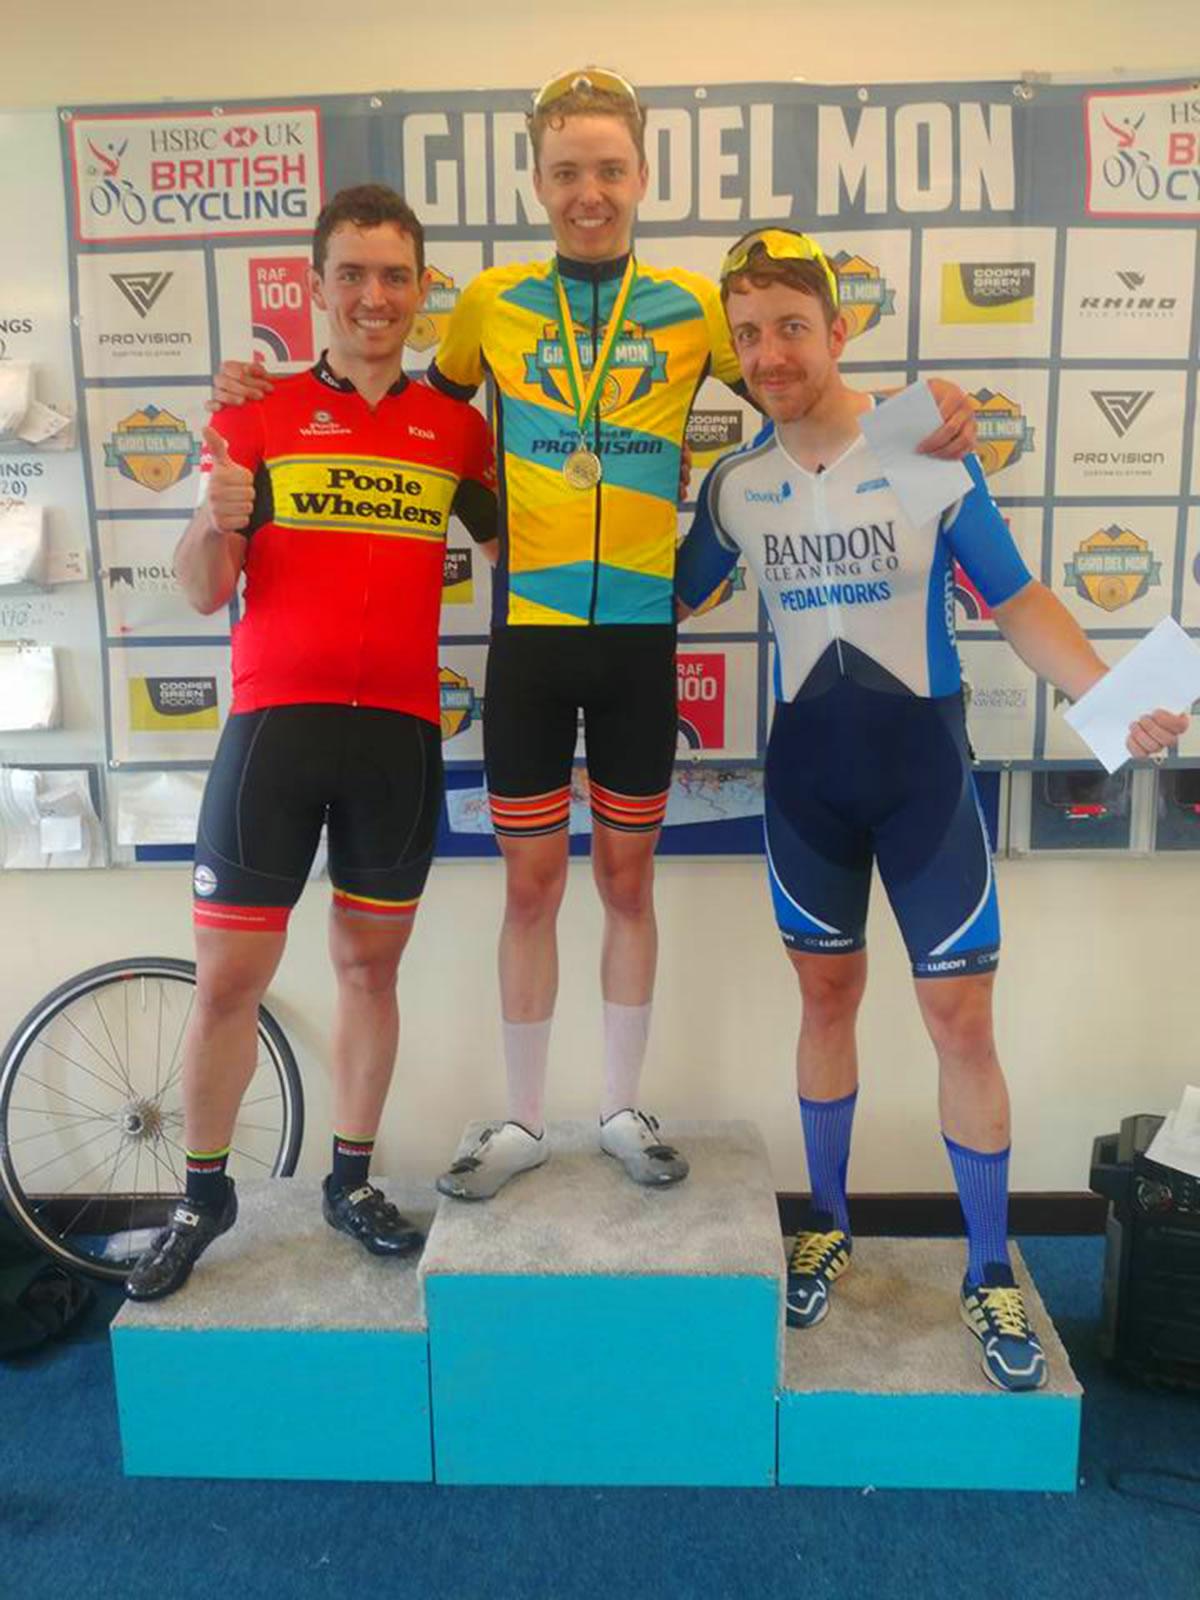 frodsham wheelers win giro del mon